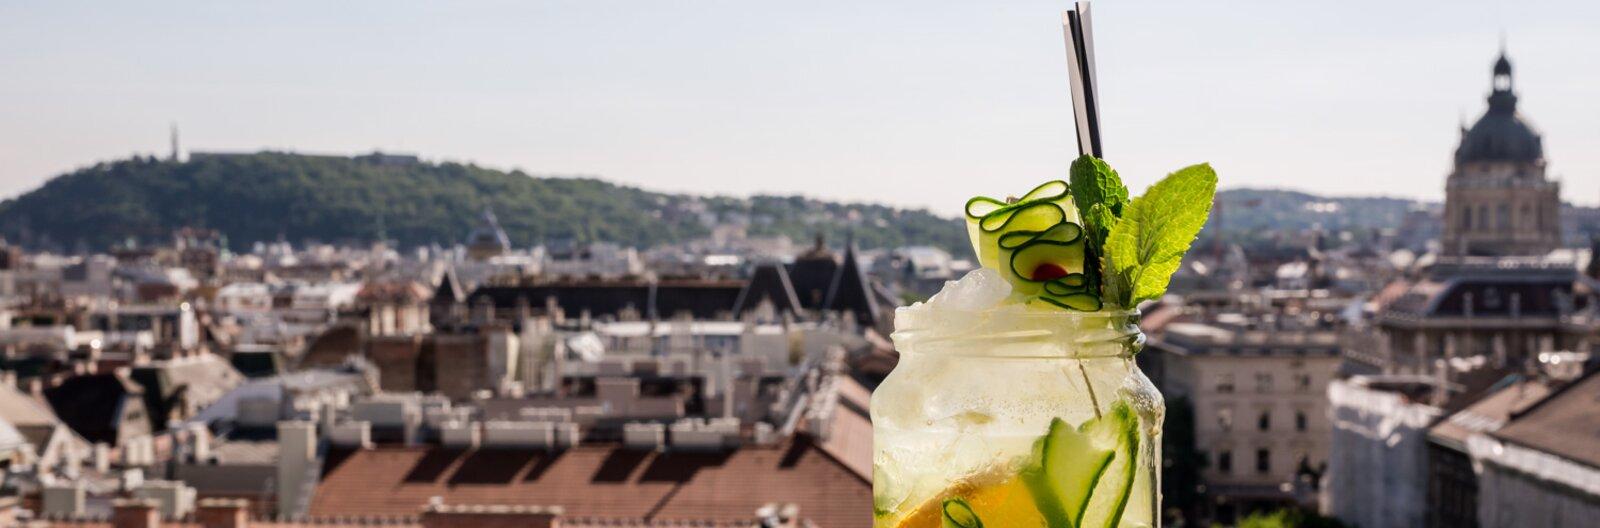 12 Budapest hotspots with the best lemonades